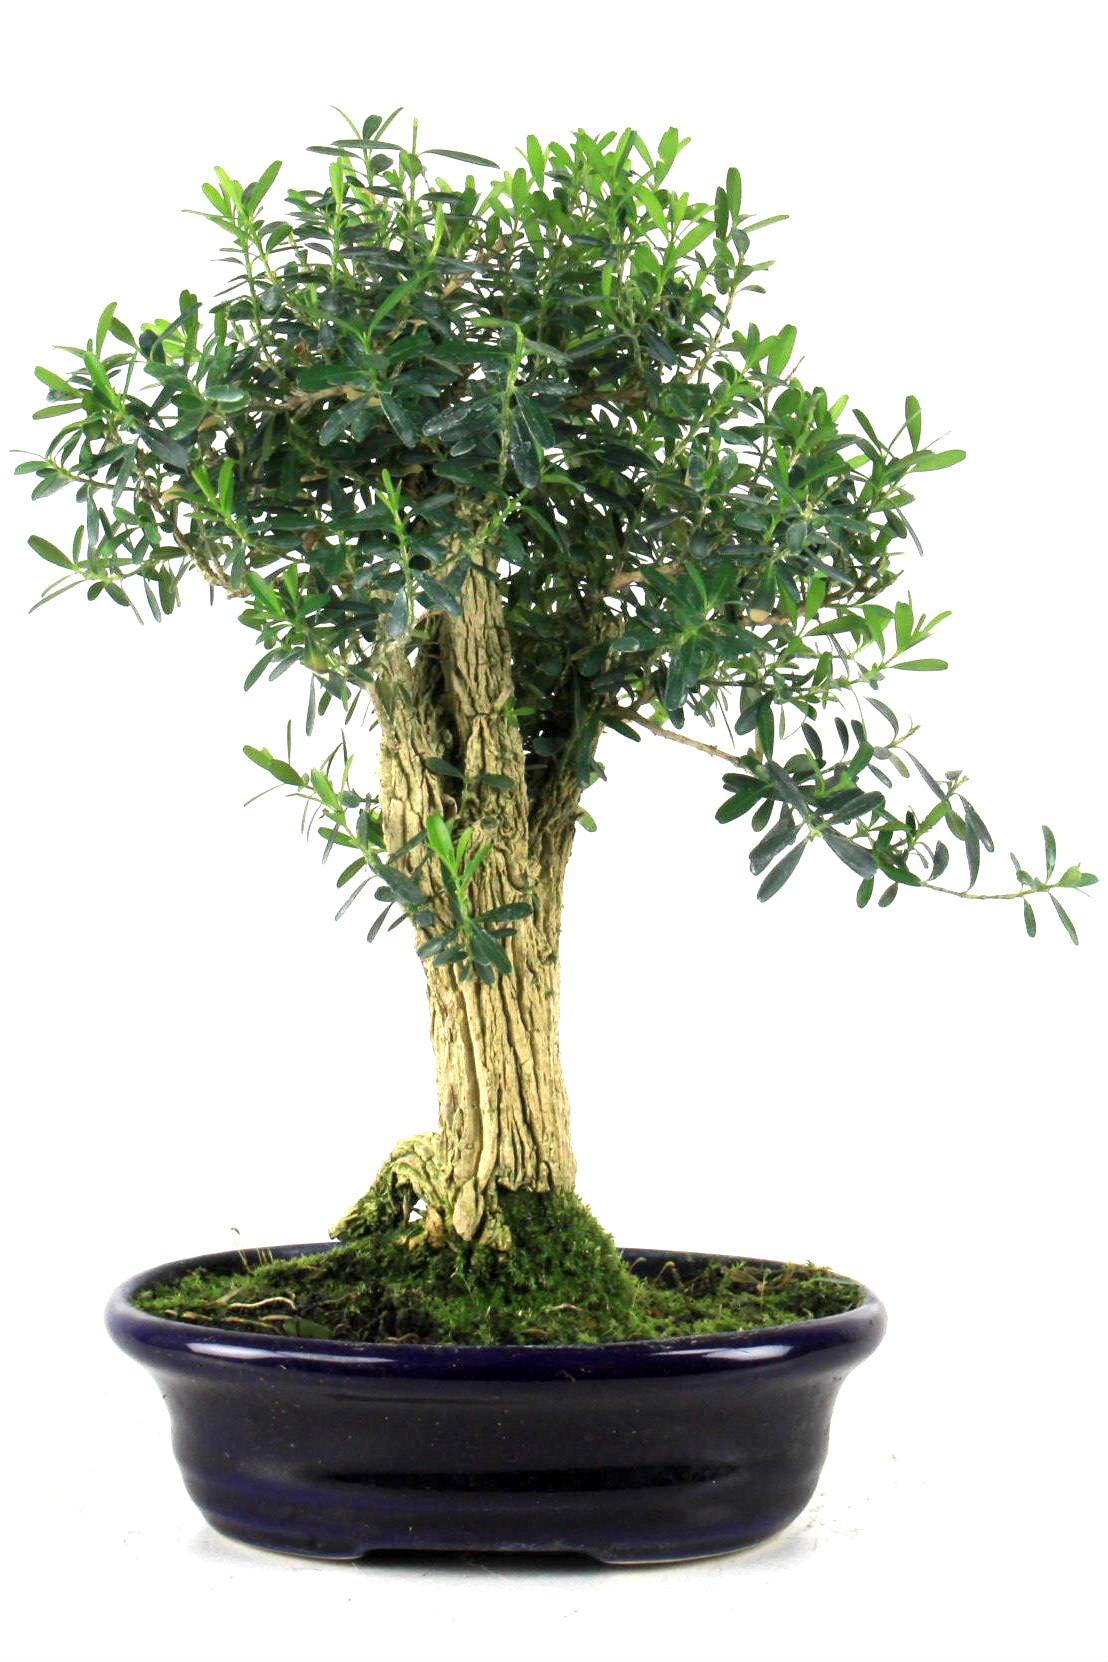 harland buxbaum 33 cm 30 bei oyaki bonsai kaufen. Black Bedroom Furniture Sets. Home Design Ideas